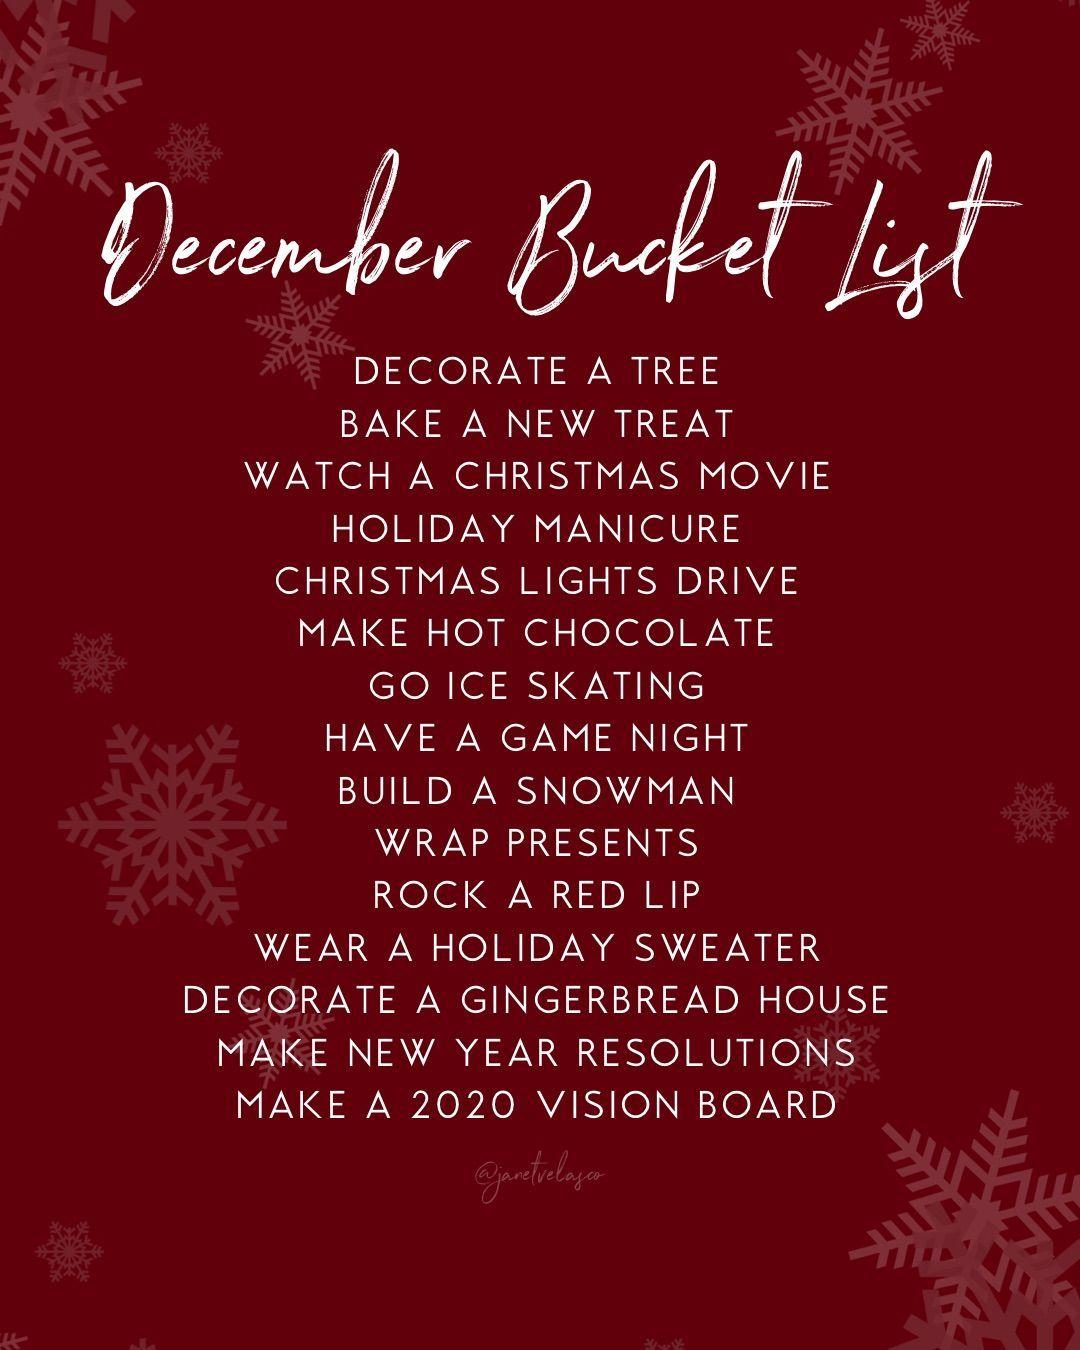 December Bucket List in 2020 Bucket list, Holiday